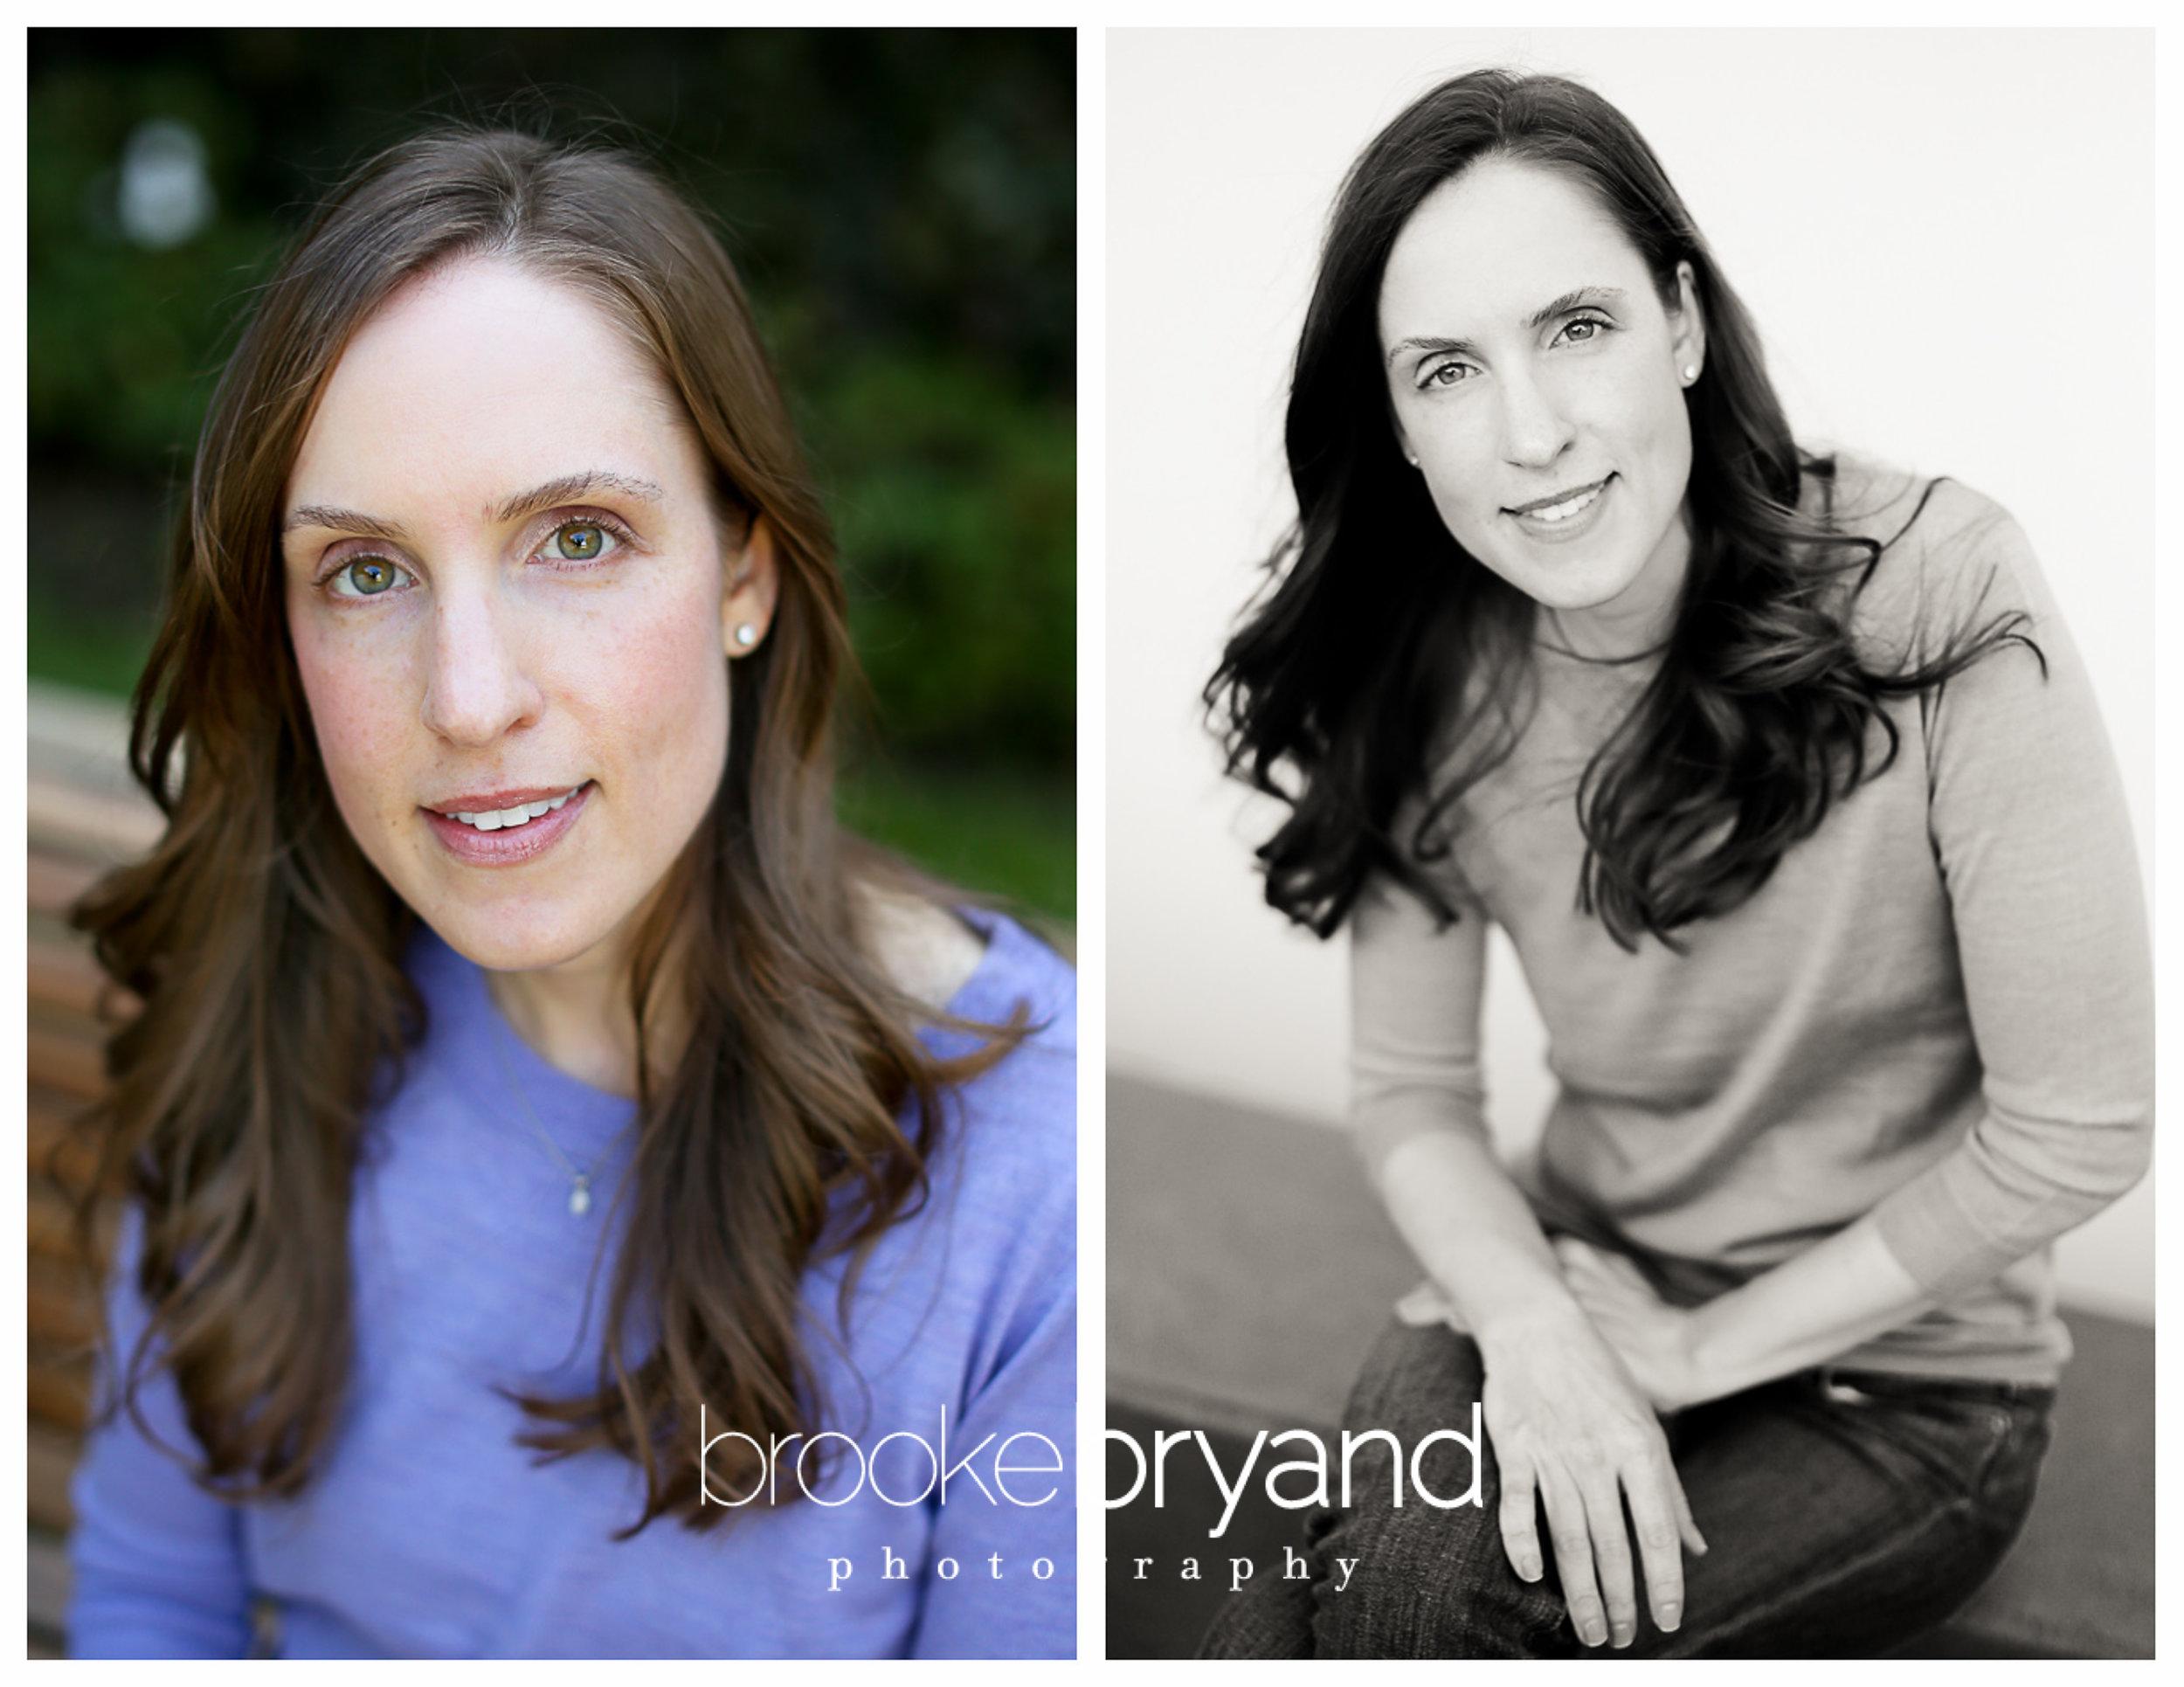 09.2013-Brown-San-Francisco-Headshot-Photographer-San-Francisco-Lifestyle-Headshot-Portrait-Brooke-Bryand-Photography-2-up-alexandra-1.jpg